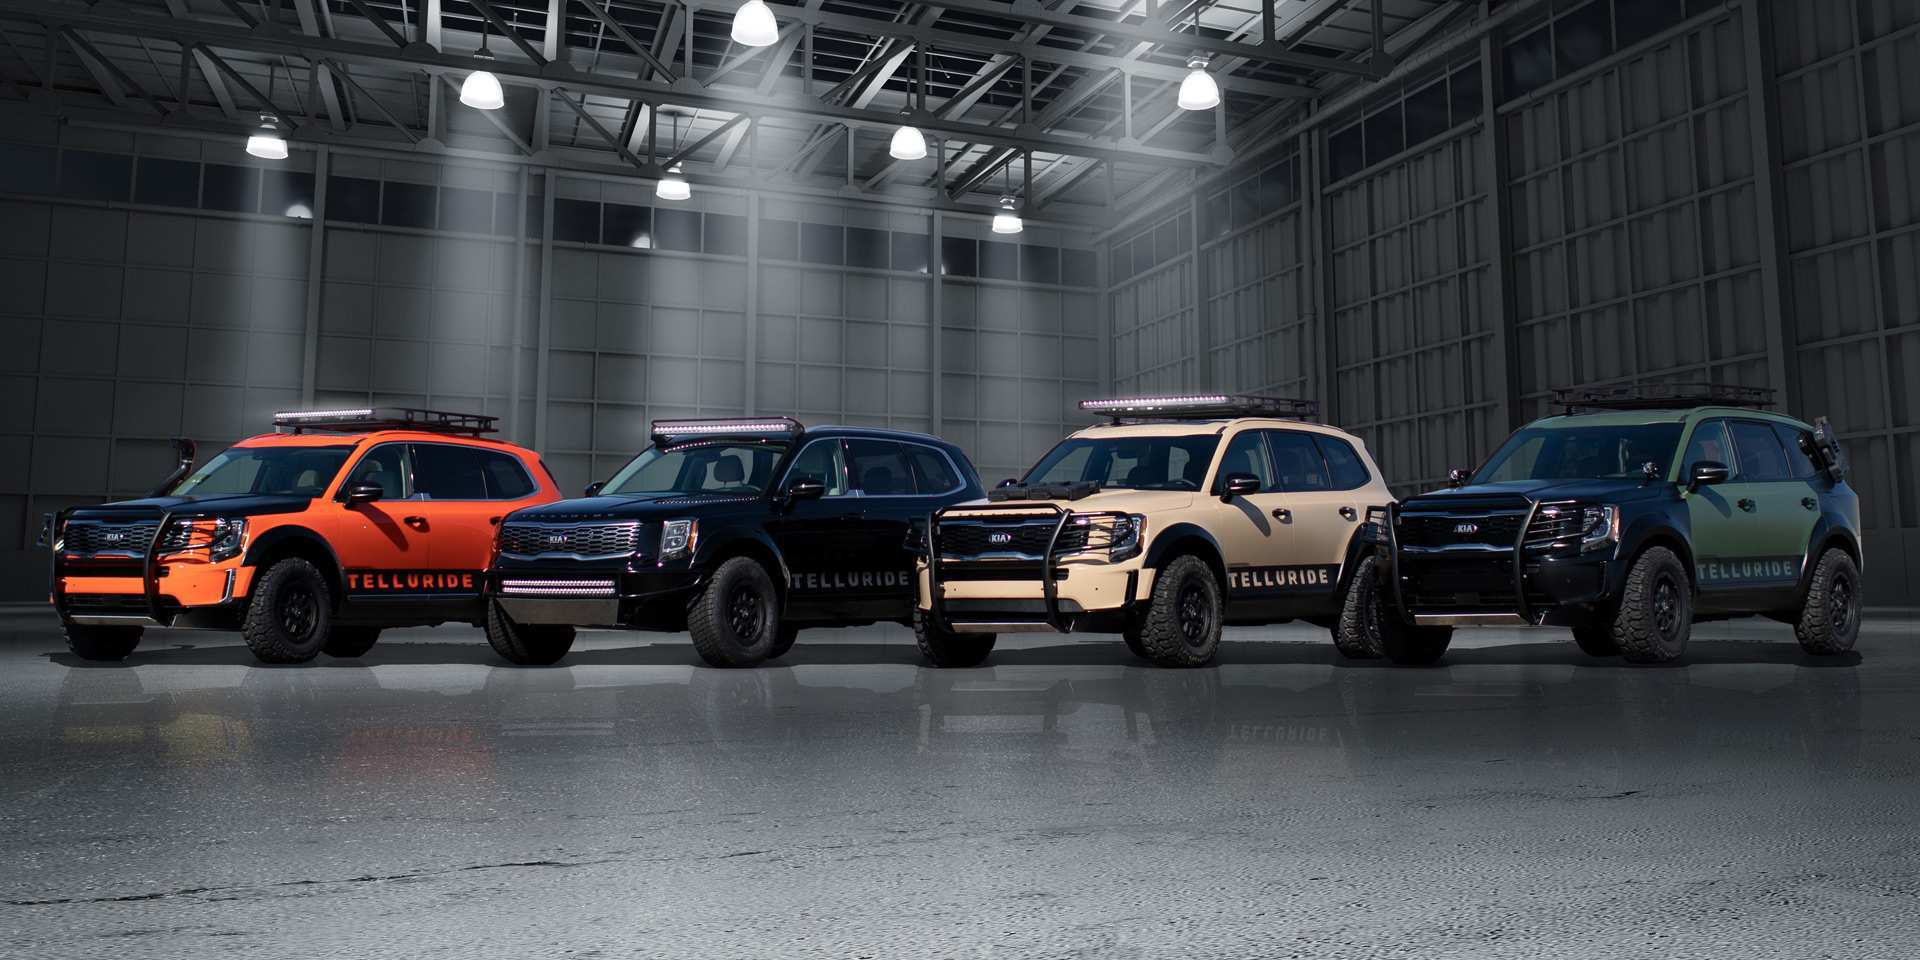 64 Gallery of Kia New Conceptos 2020 Configurations by Kia New Conceptos 2020